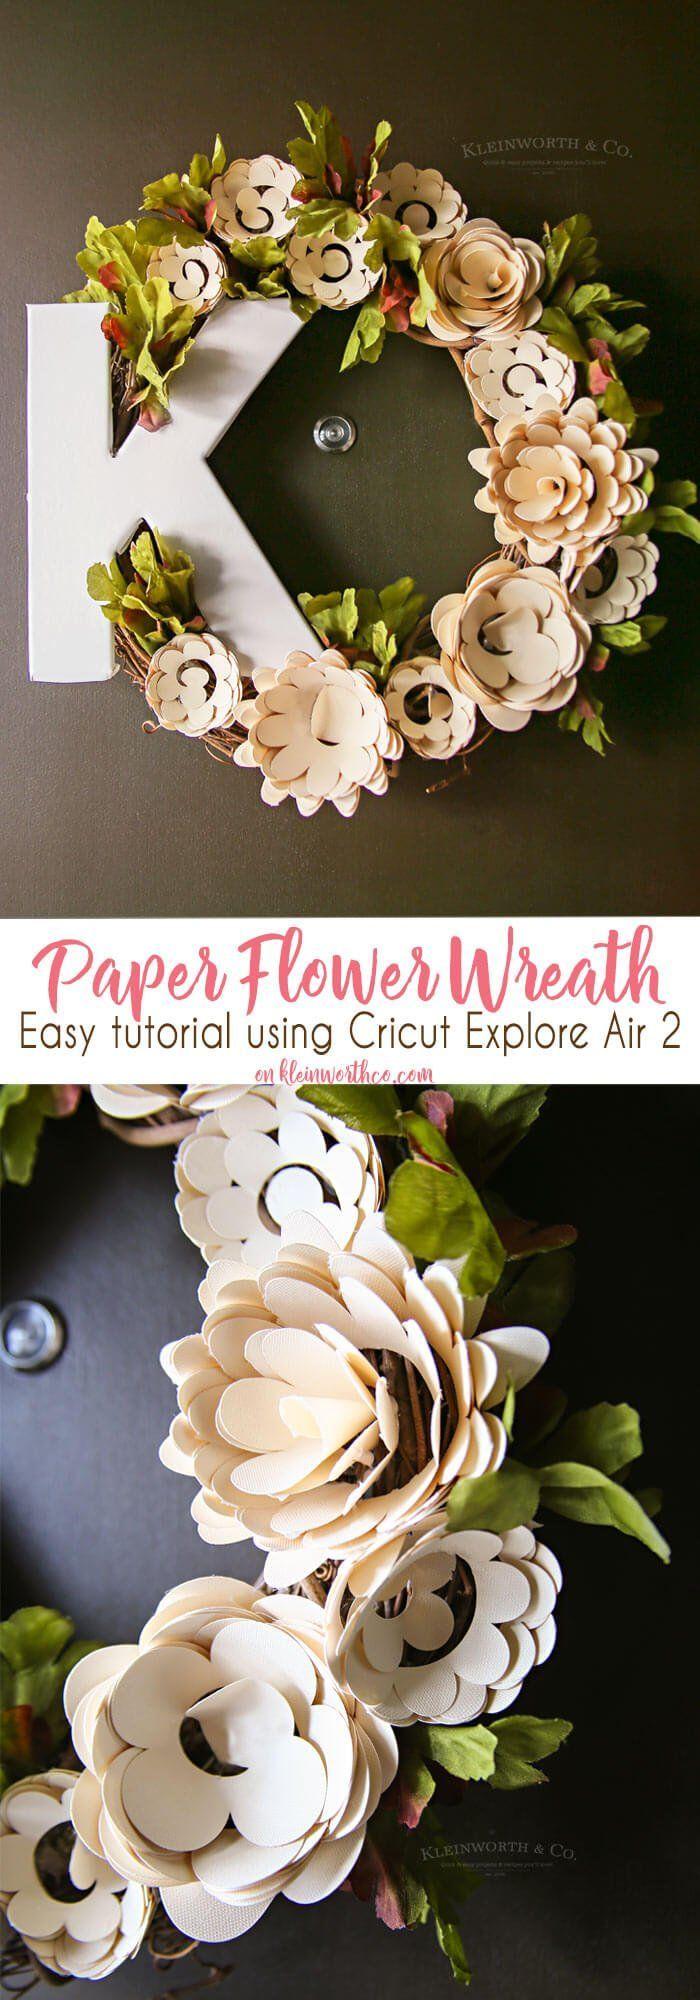 Paper Flower Wreath Cricut Tutorial#cricut #flower #paper #tutorial #wreath